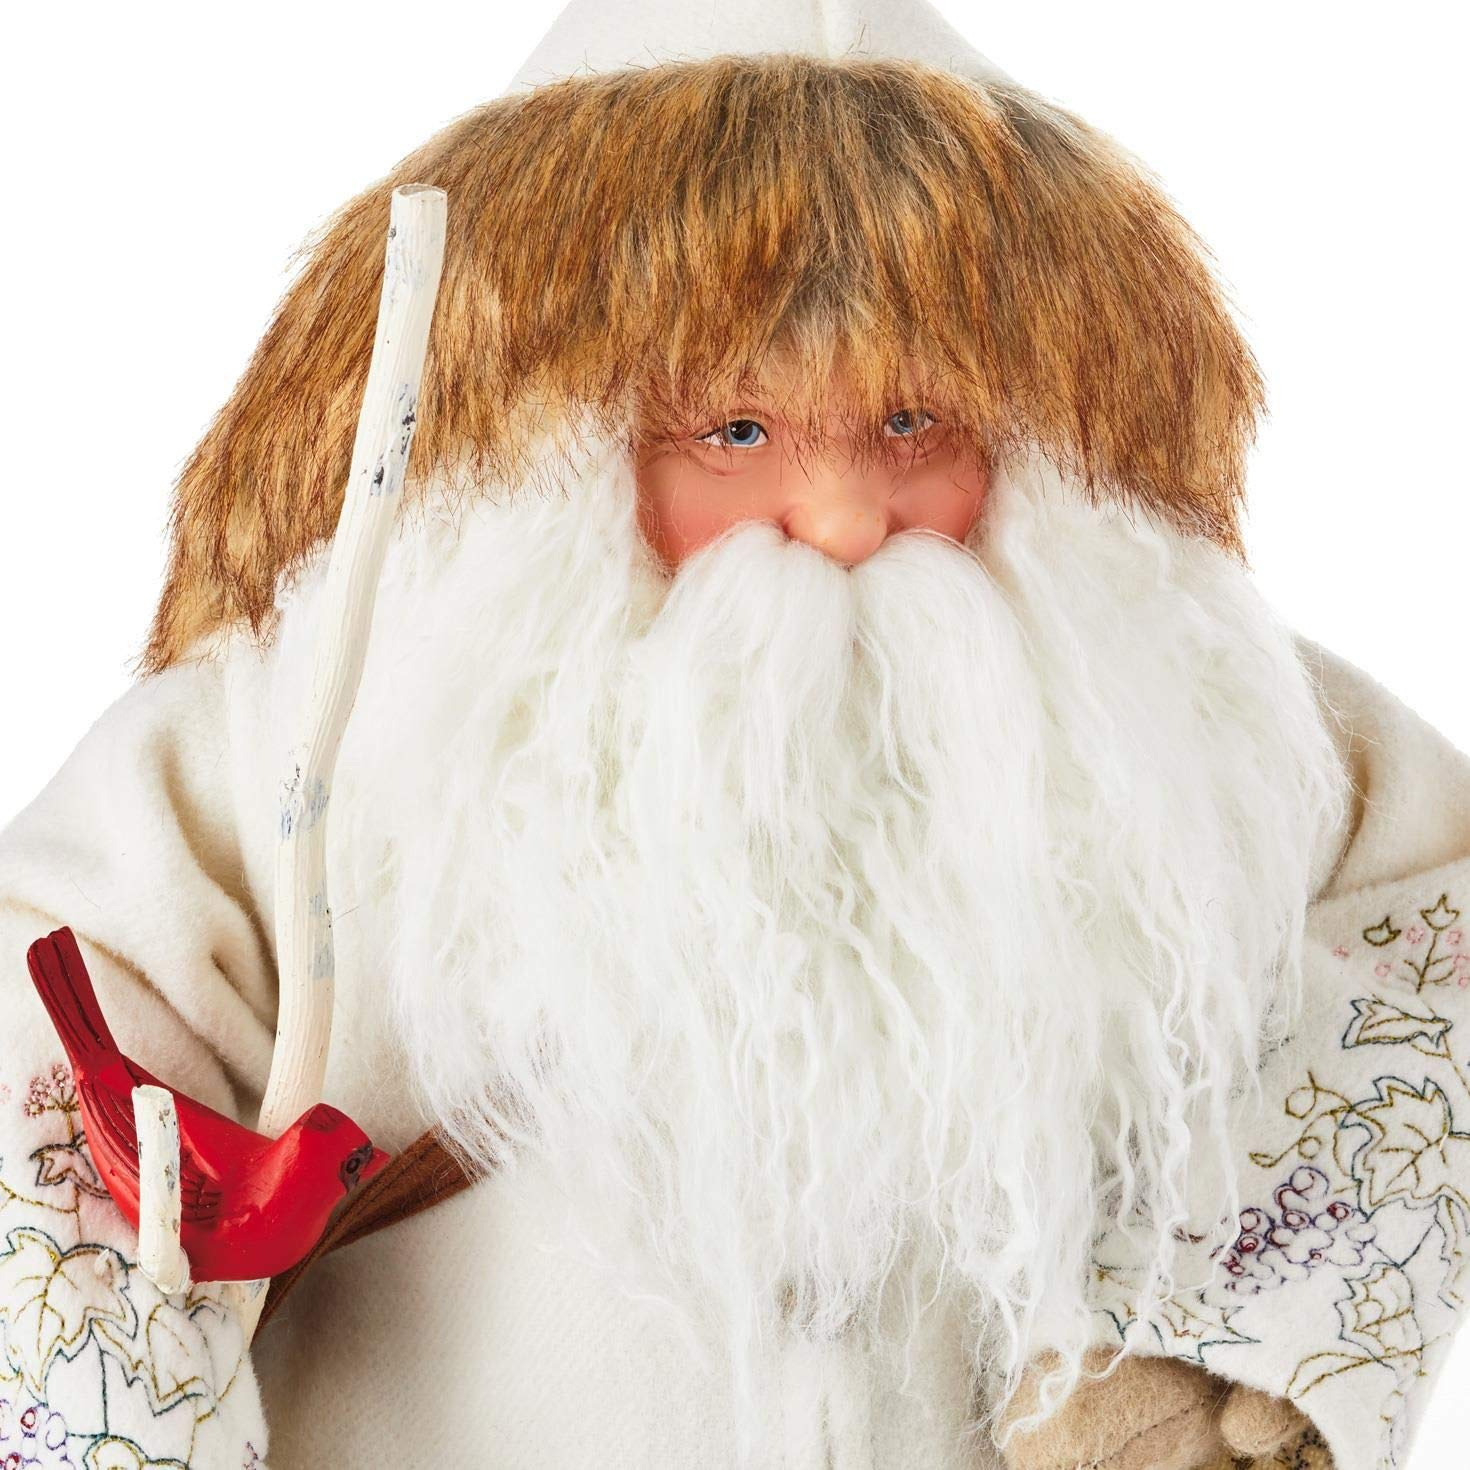 Hallmark Father Christmas Figurine, 19.5 Figurines Santa Claus